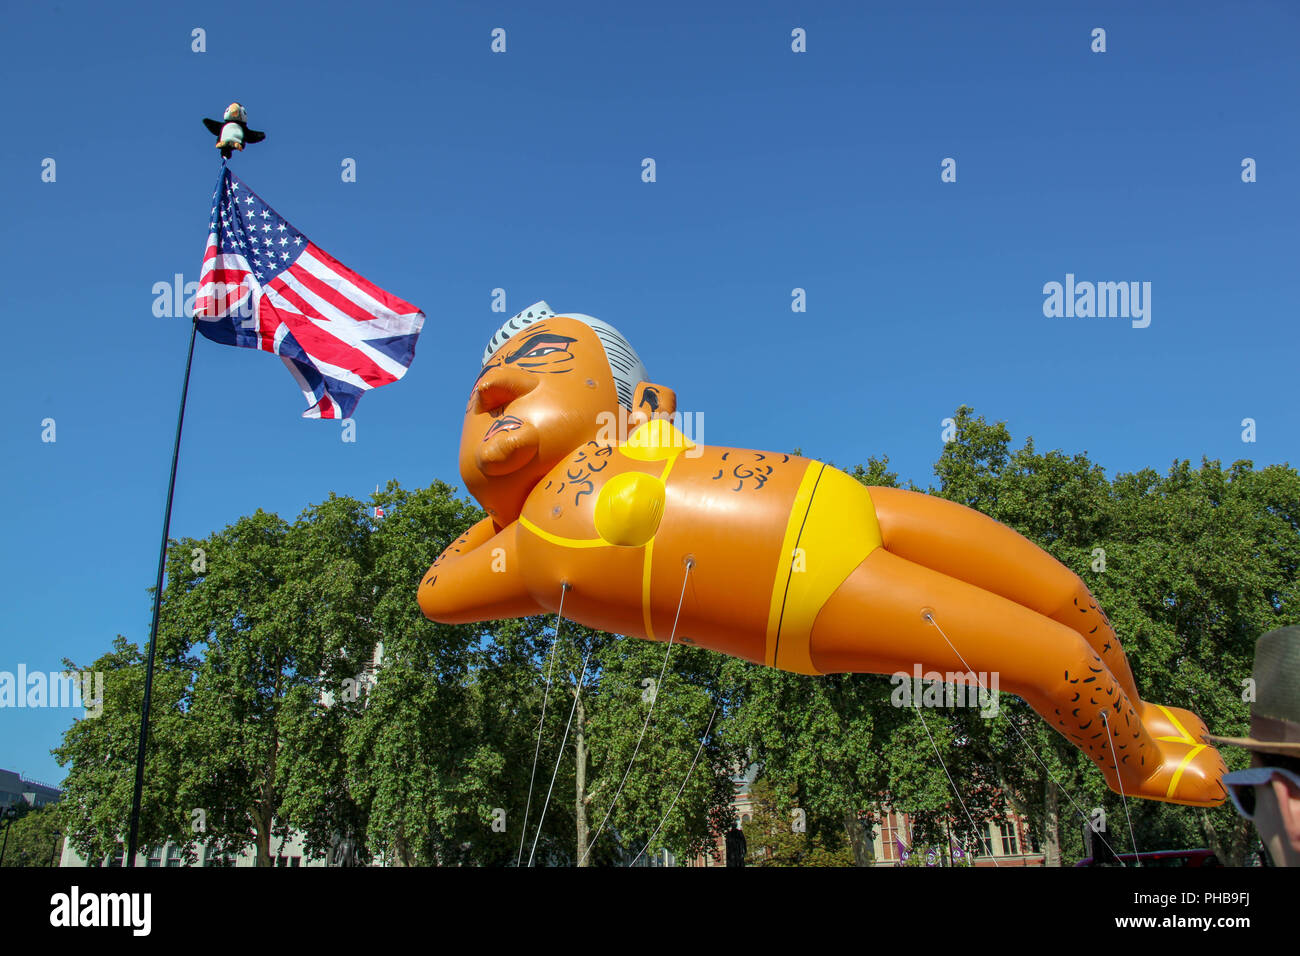 London, UK. 1st September 2018. The Sadiq Khan Balloon with a US/UK Flag Credit: Alex Cavendish/Alamy Live News - Stock Image